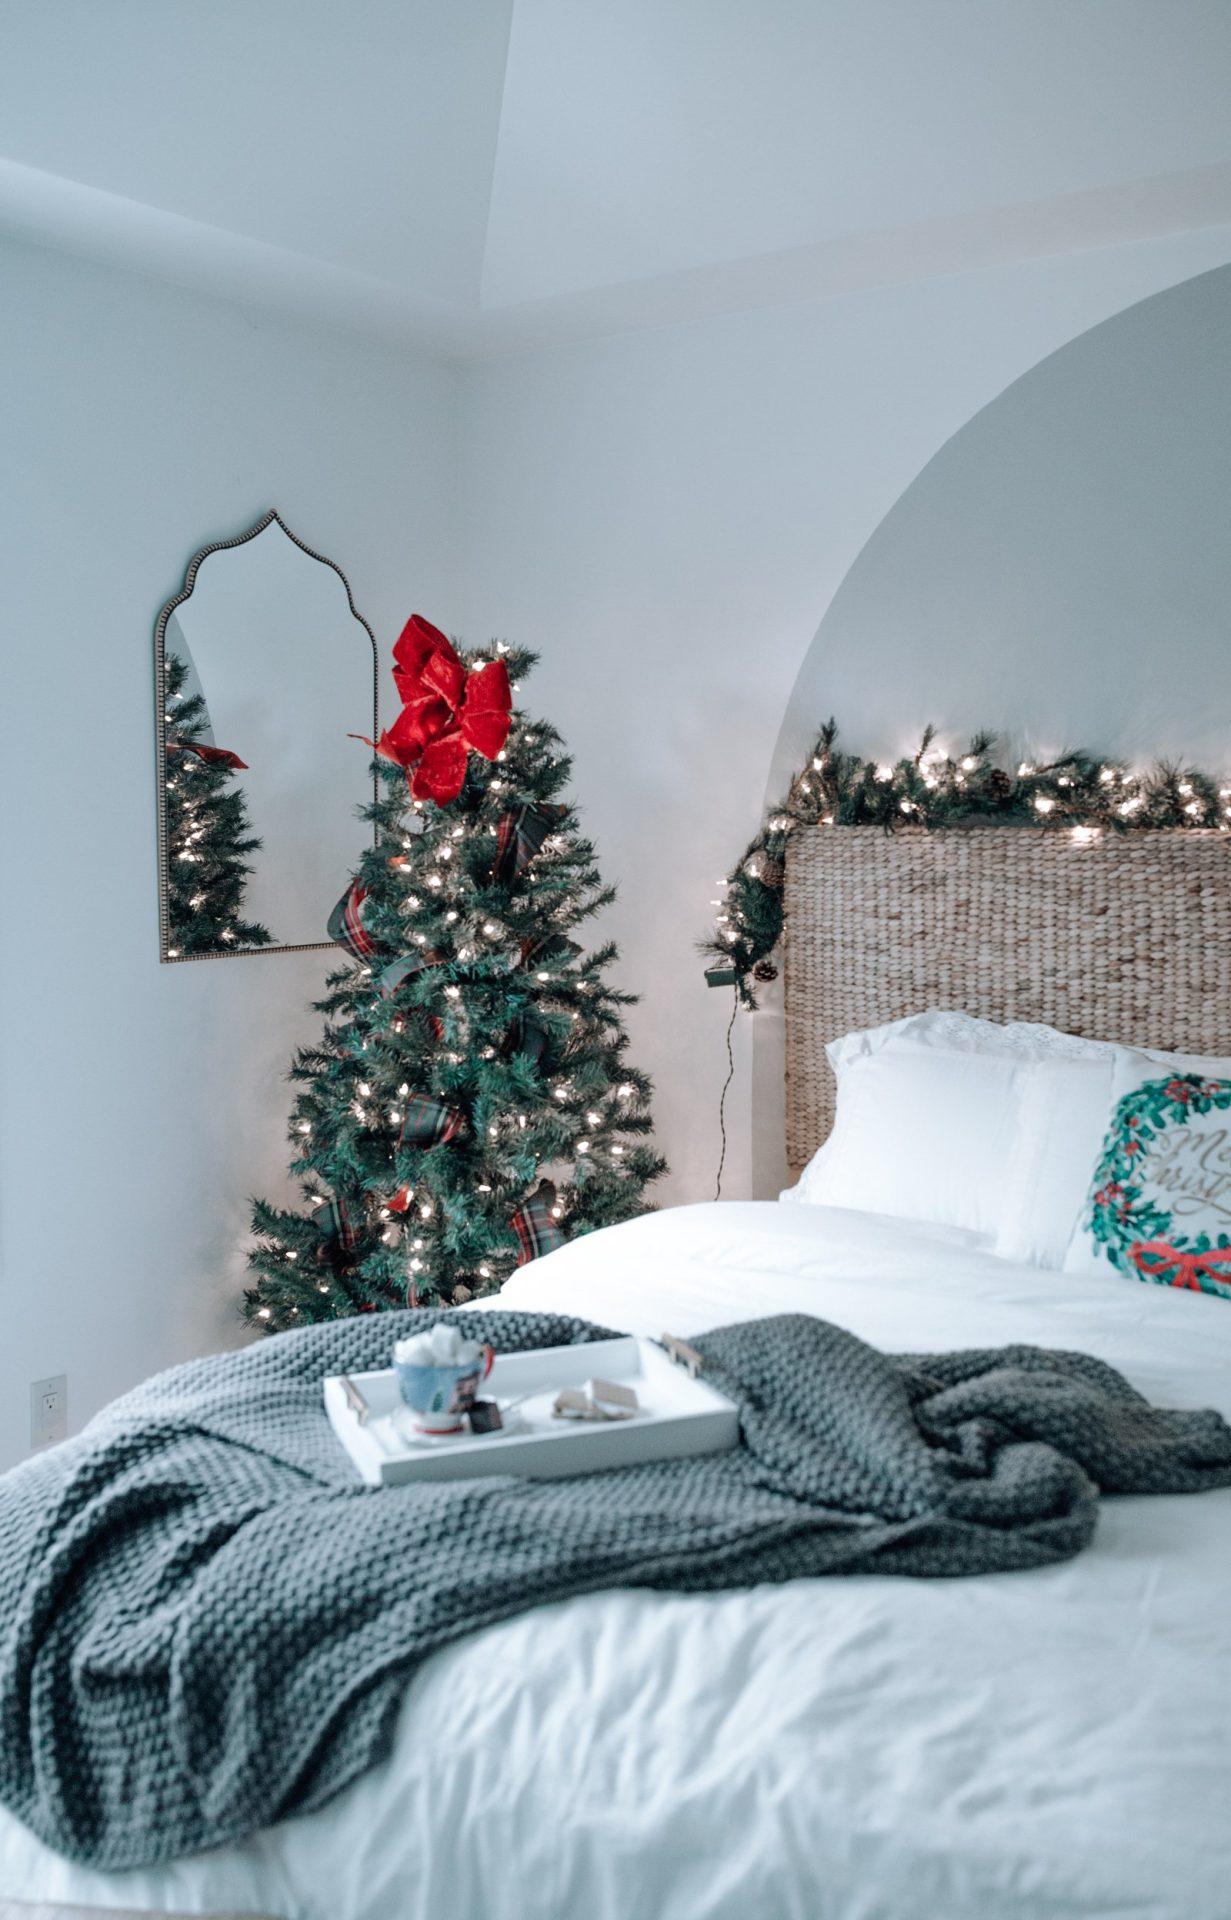 holiday bedroom decor